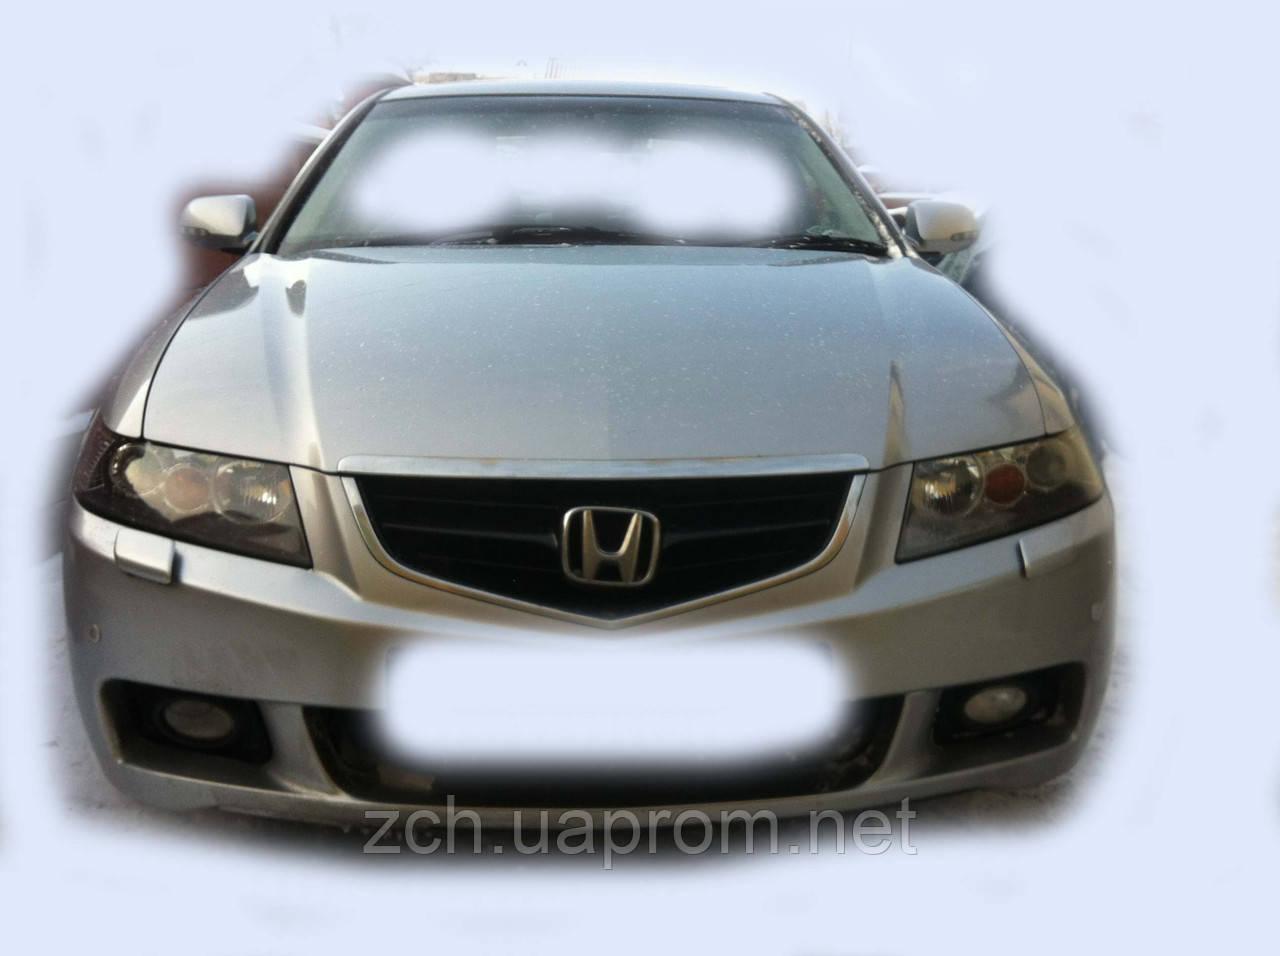 Лямбдазонд 2.0 и 2.4 Honda Accord